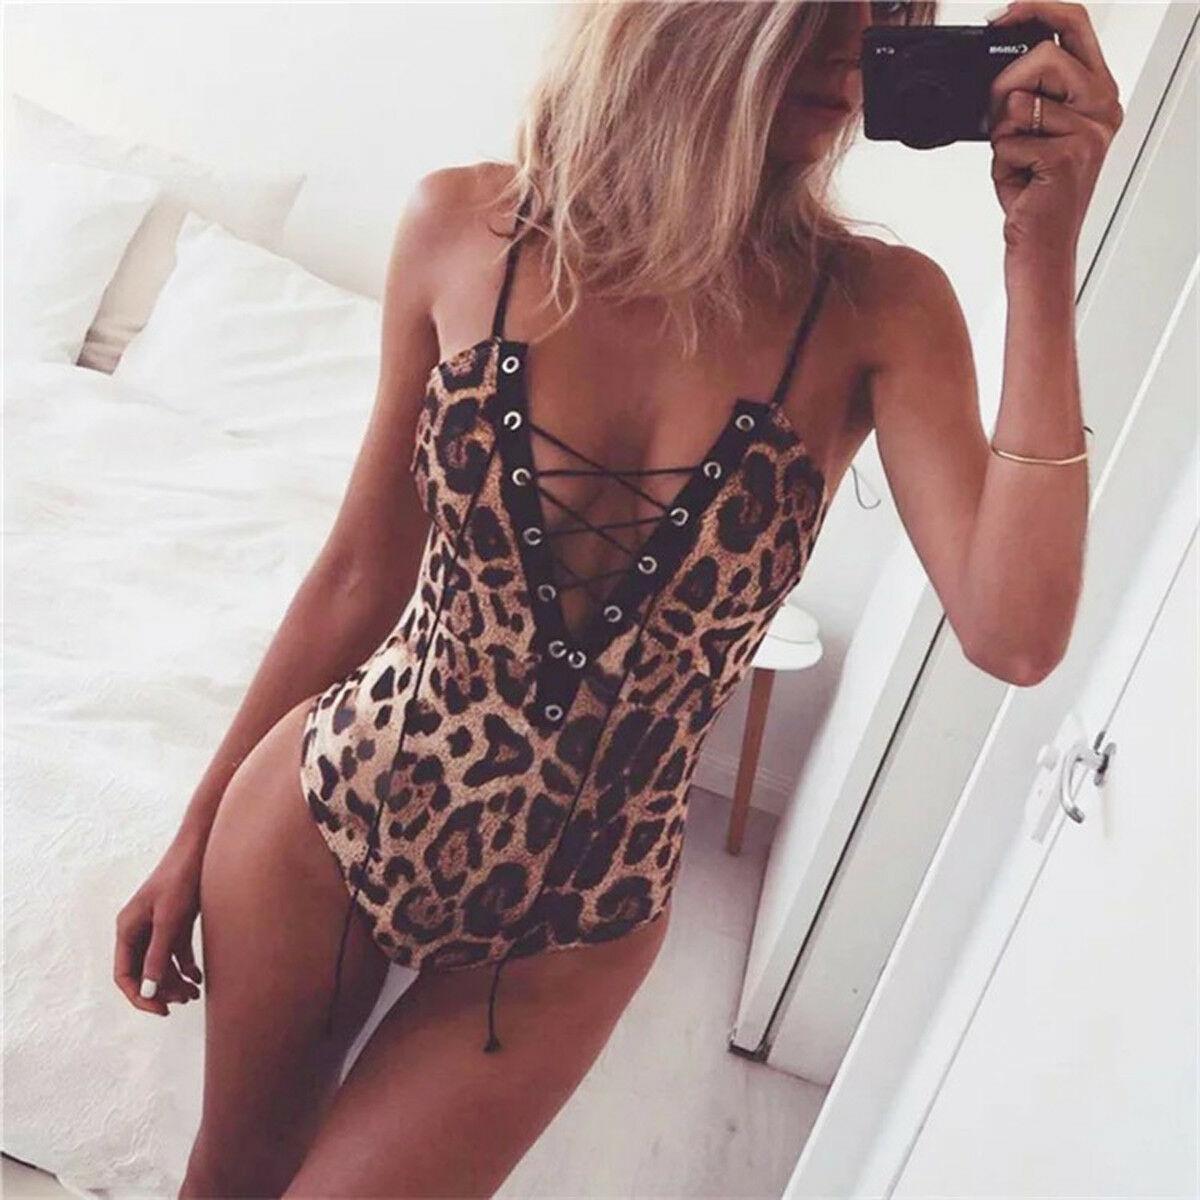 Womens Sexy Hot Catsuit Leopard Print Lace Lingerie Bodysuit Nightwear Underwear Sexy Suit Erotic Sex Costume